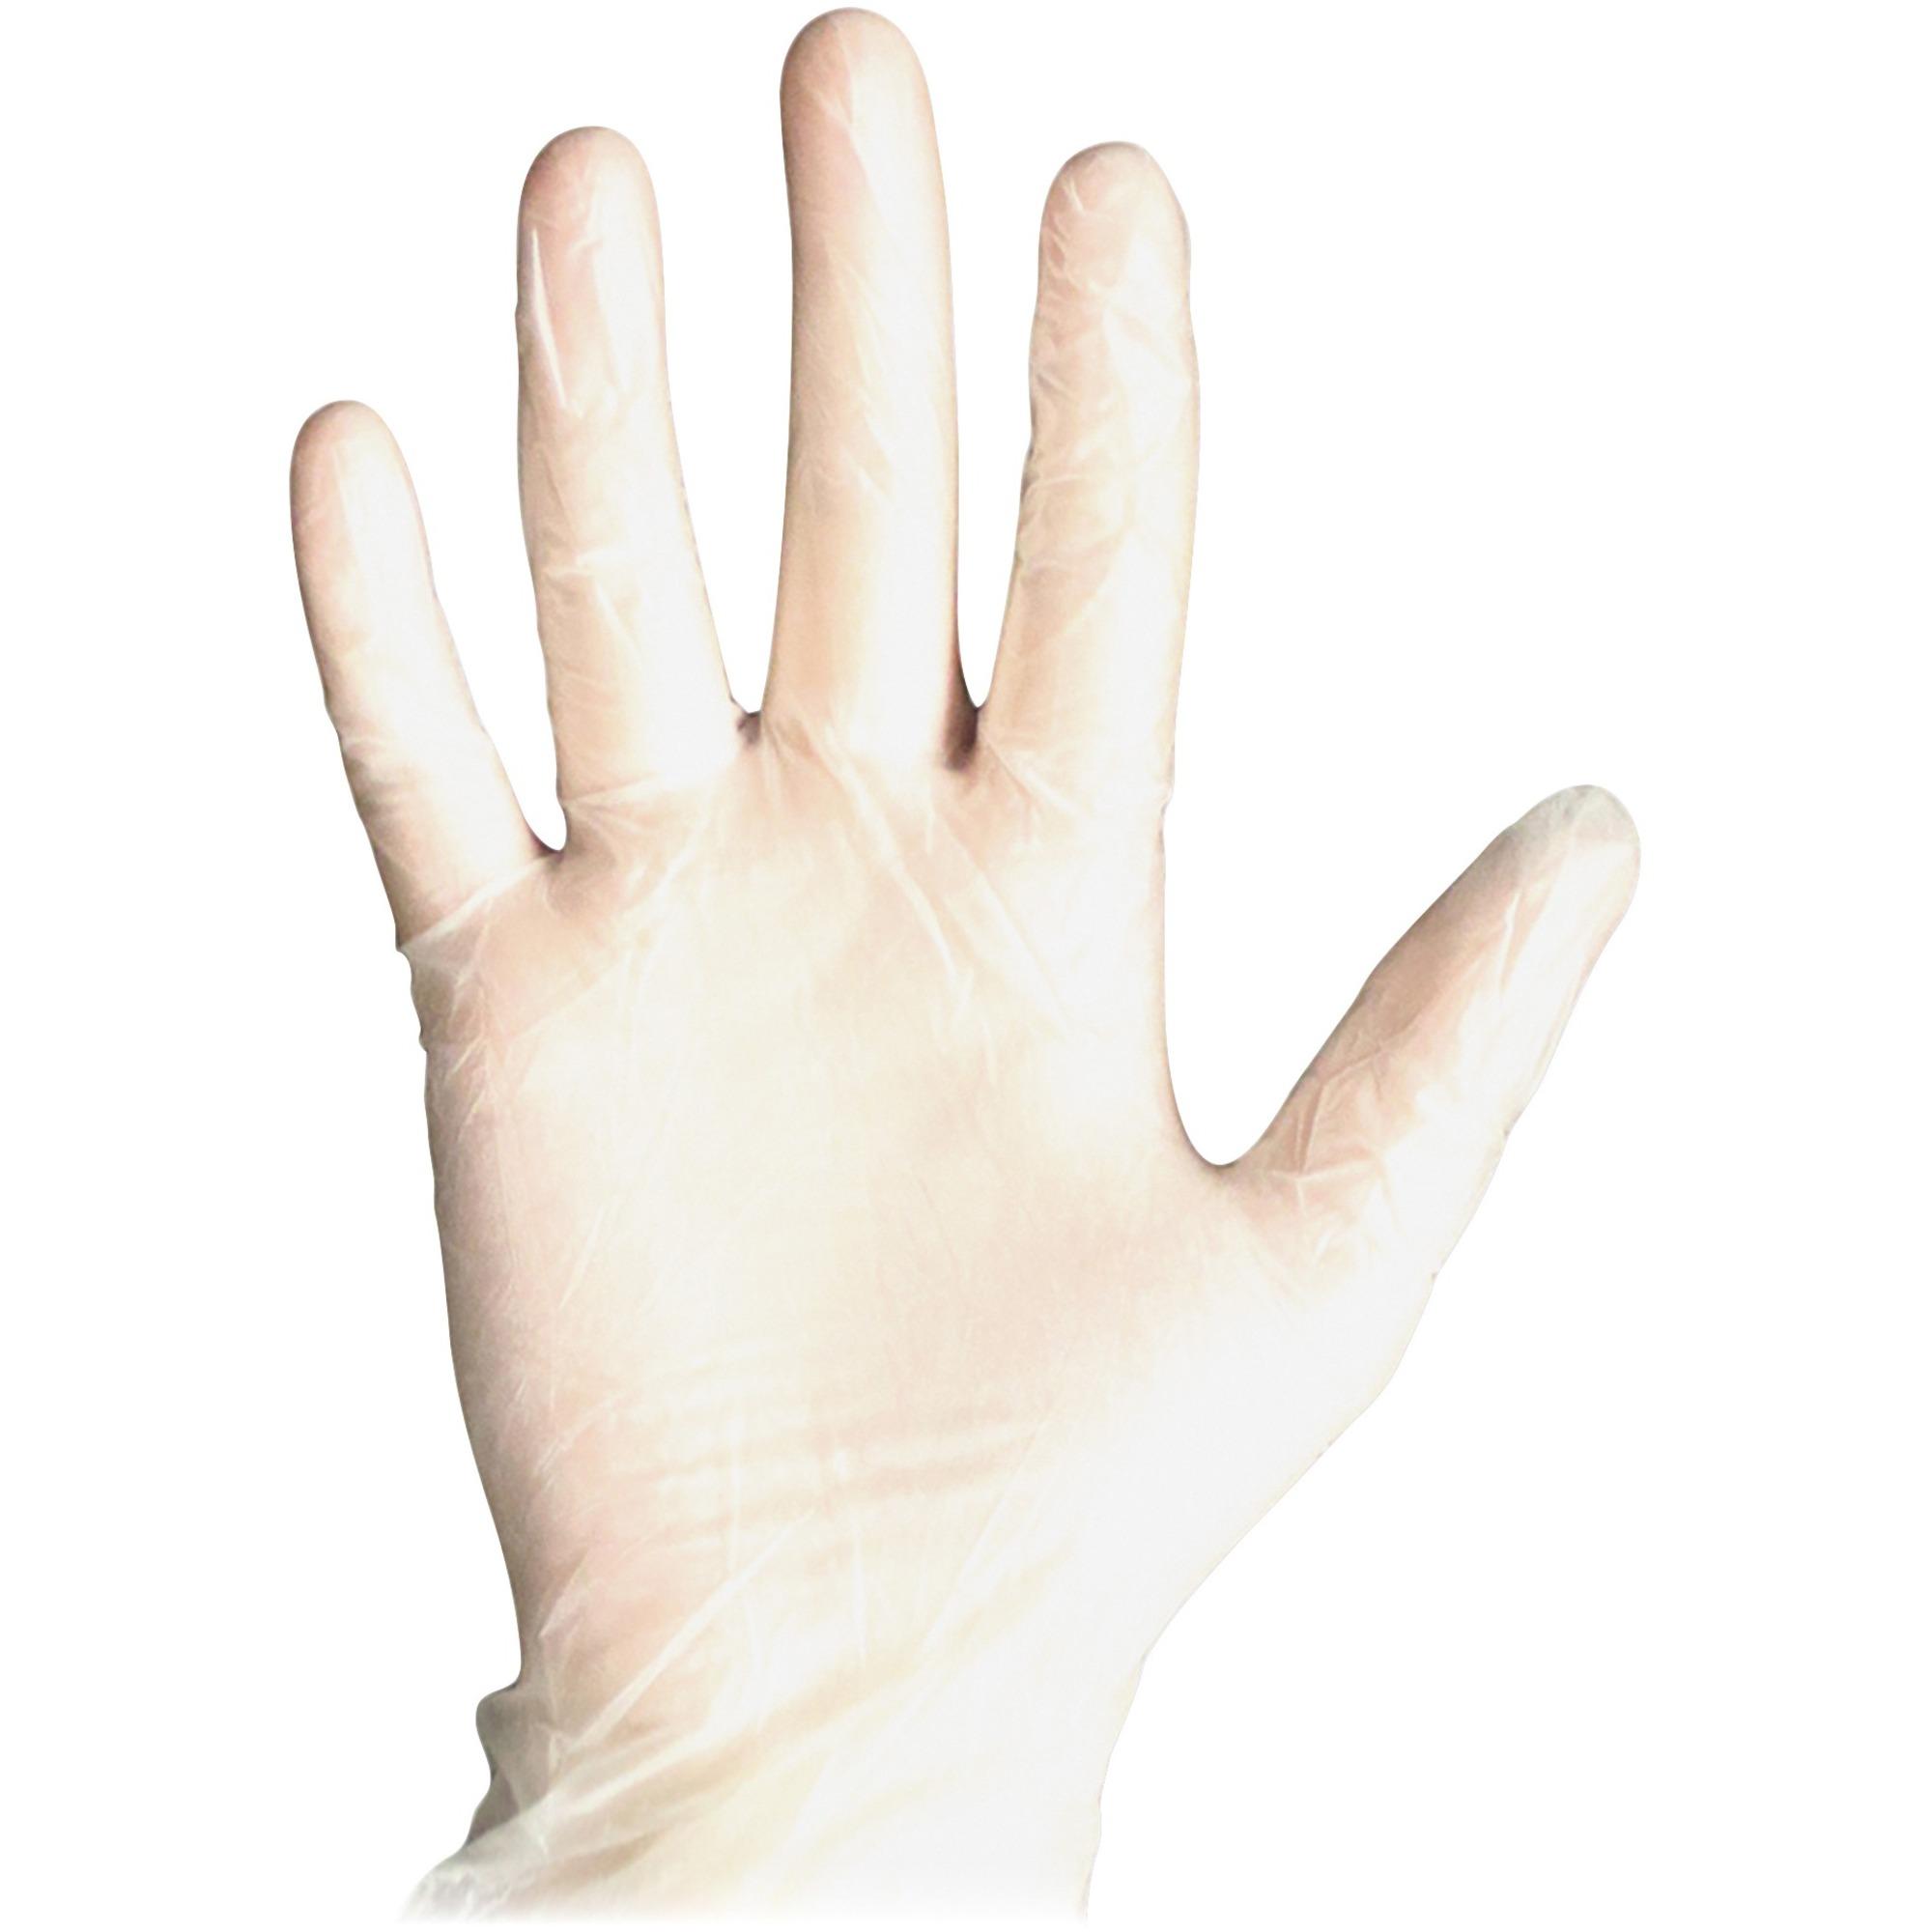 DiversaMed Disposable PF Medical Exam Gloves